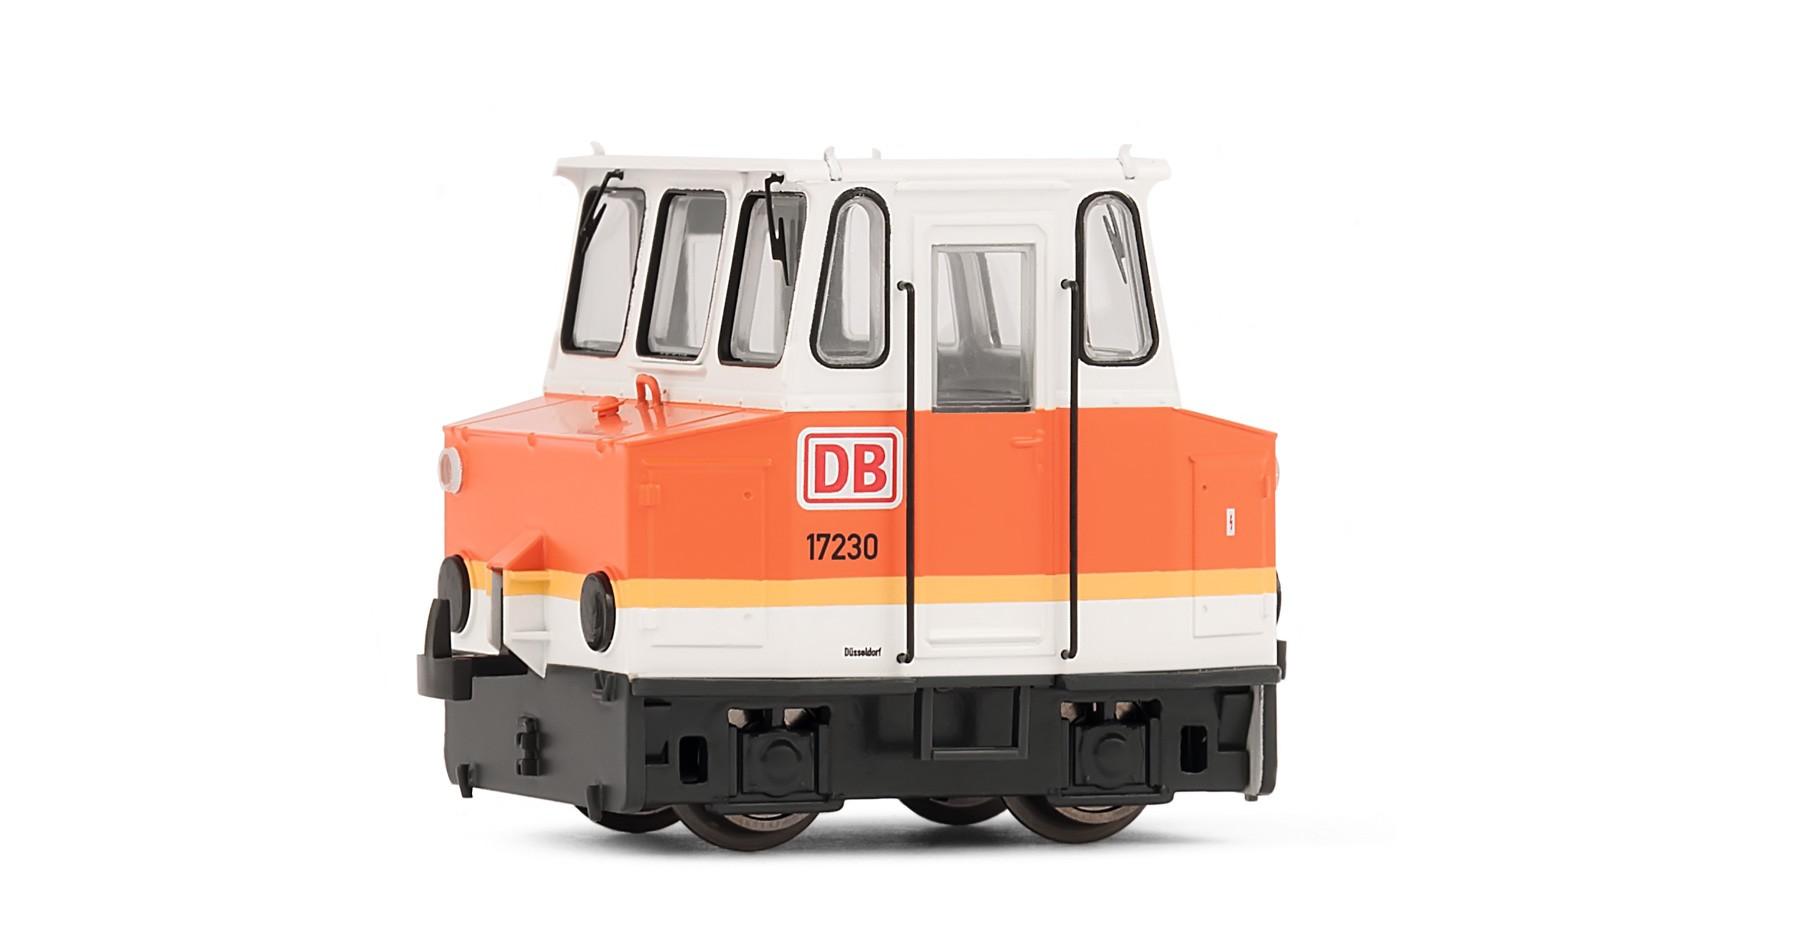 HR2378accumulator-shunting-locomotive-of-the-db-ag-livery-17230-white-orange